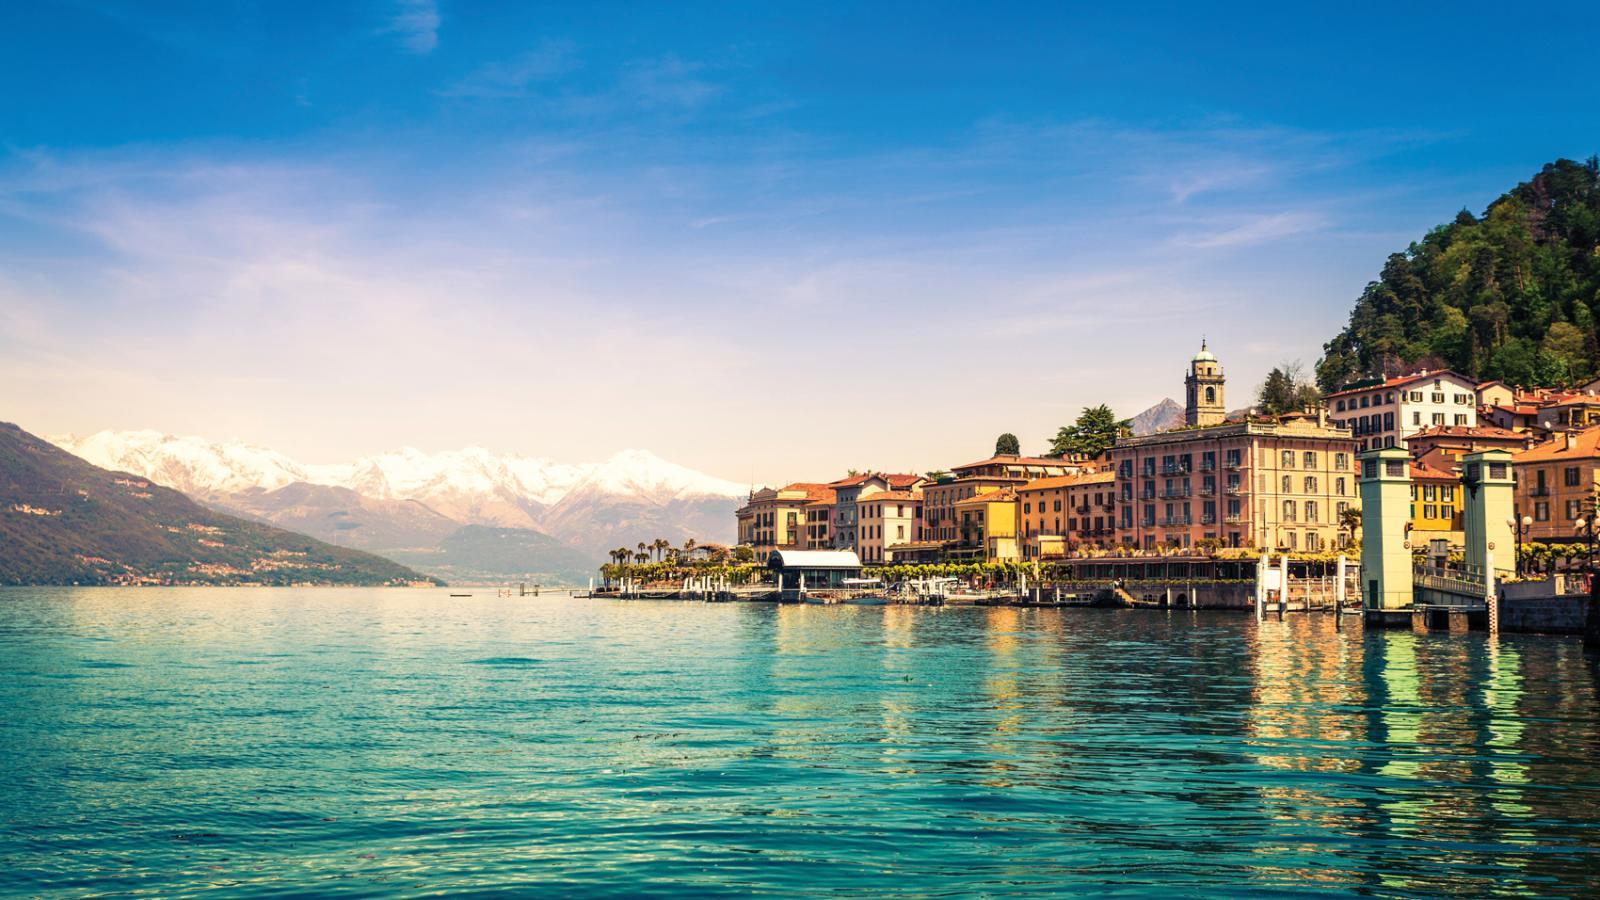 Full Hd Widescreen Wallpapers 1920x1080 Lake Como Holidays 2016 Topflight Italian Lakes